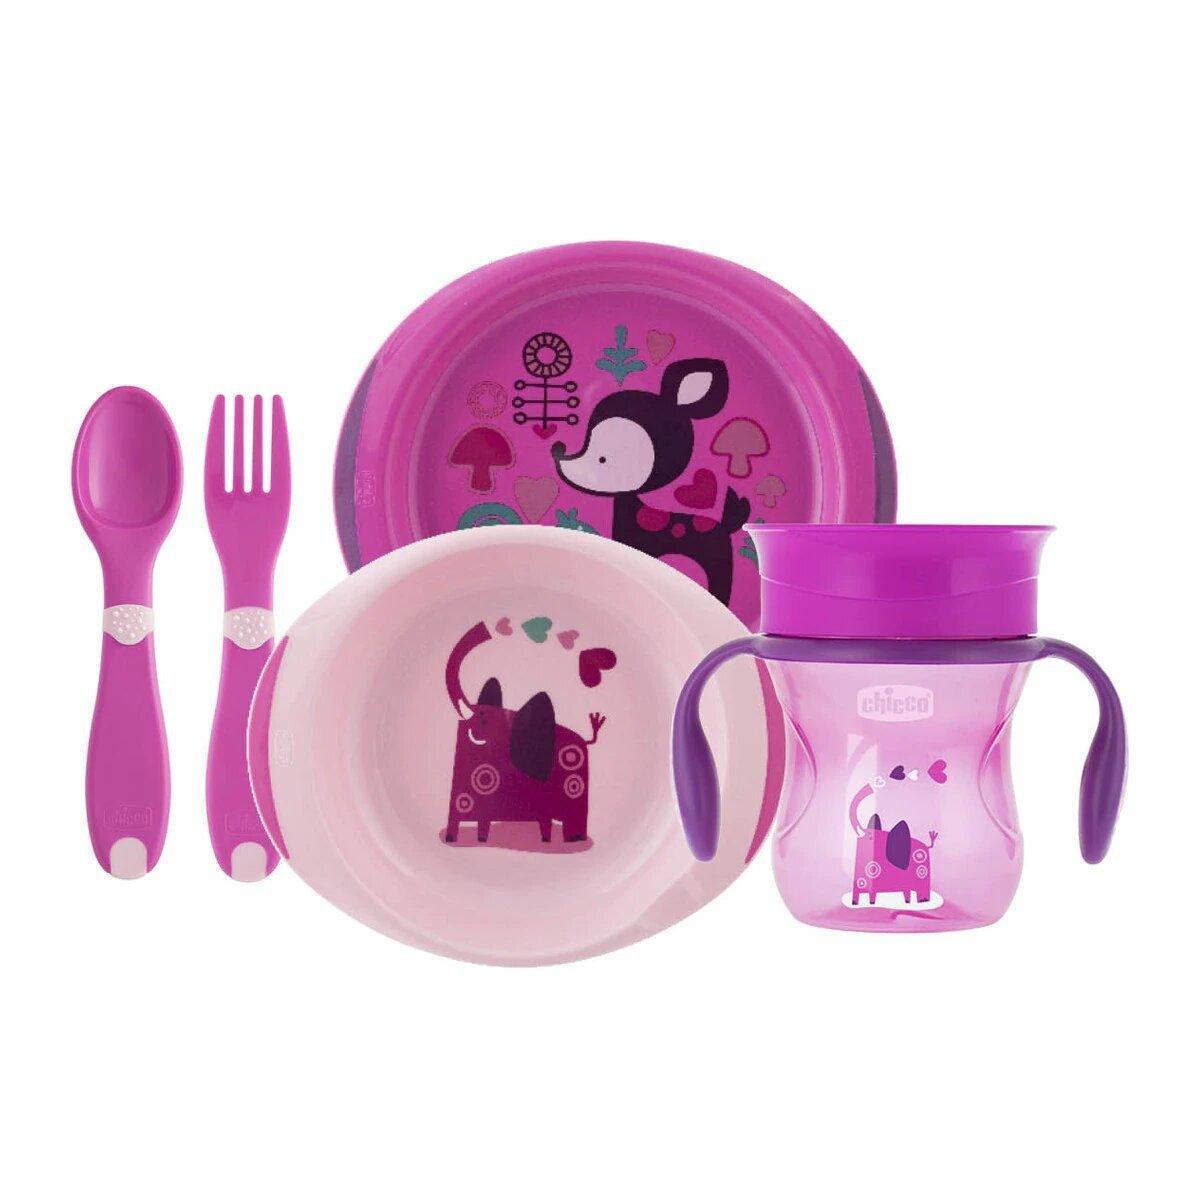 Набір посуду Chicco Meal Set, 12м+